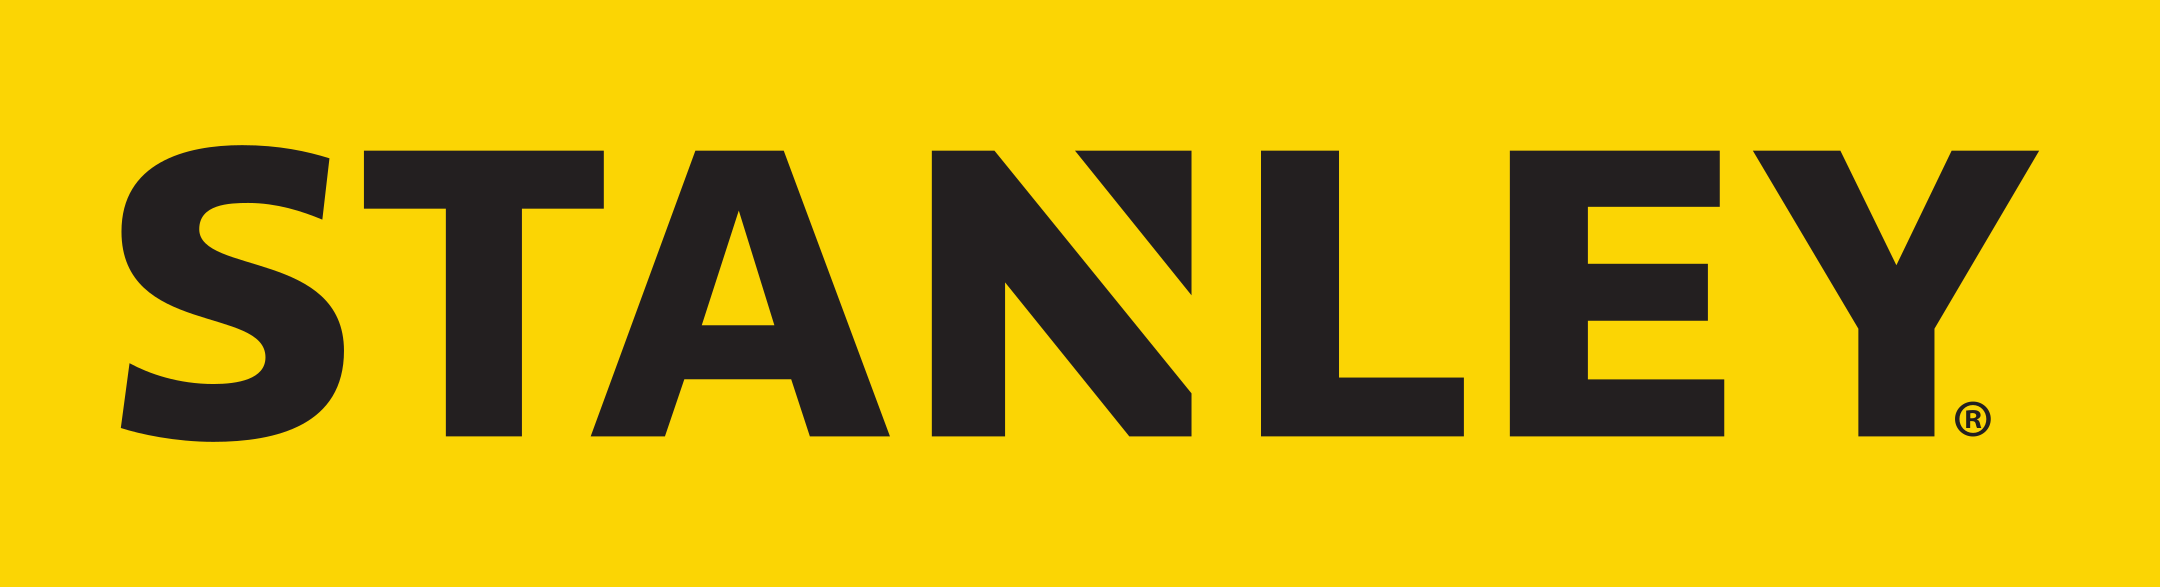 stanley logo 1 - Stanley Logo